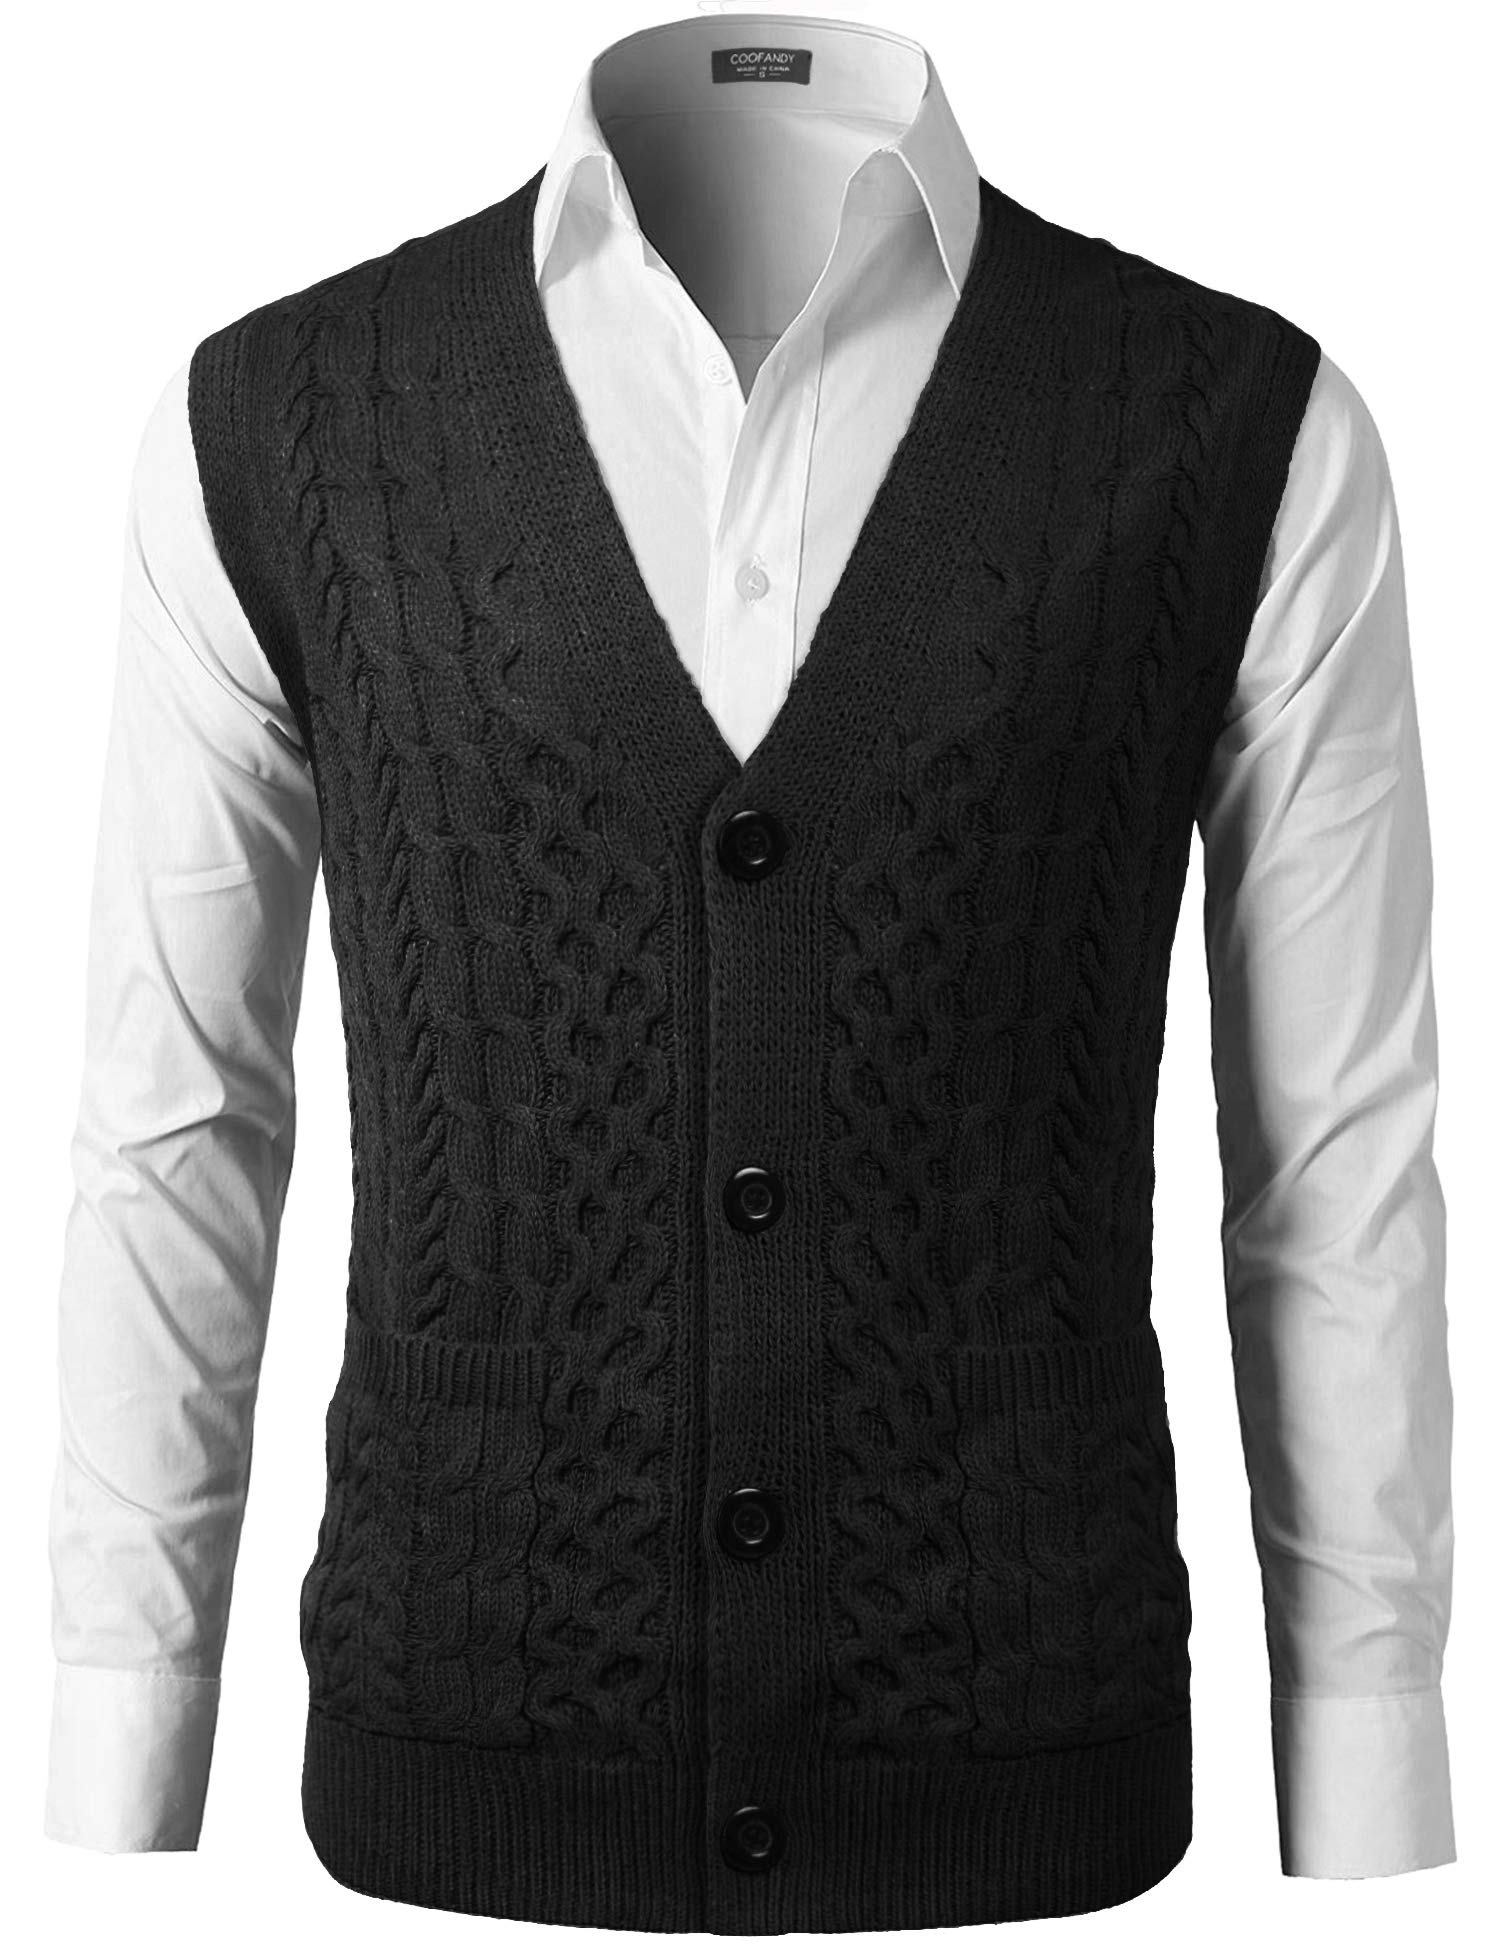 COOFANDY Men's V-Neck Jacquard Sweater Vest Classic Knitwear Cardigan Waistcoat Black by COOFANDY